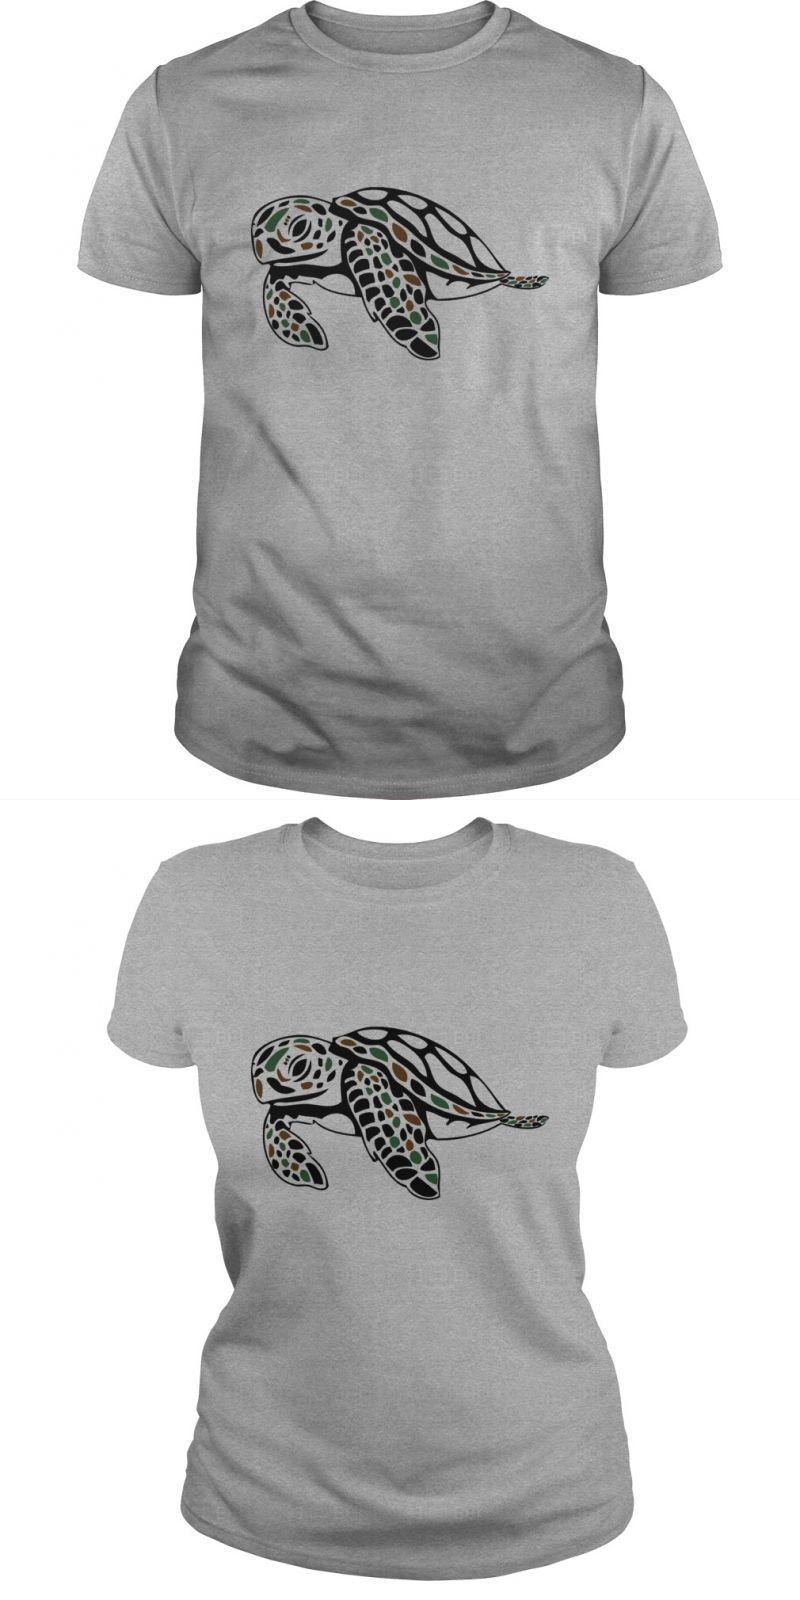 267f91050 Darrseaturtle Womens Tshirts Sid Vicious T Shirt Ninja Turtles #i #like # turtles #t #shirt #ninja #turtles #t #shirt #target #ninja #turtles #t # shirt ...